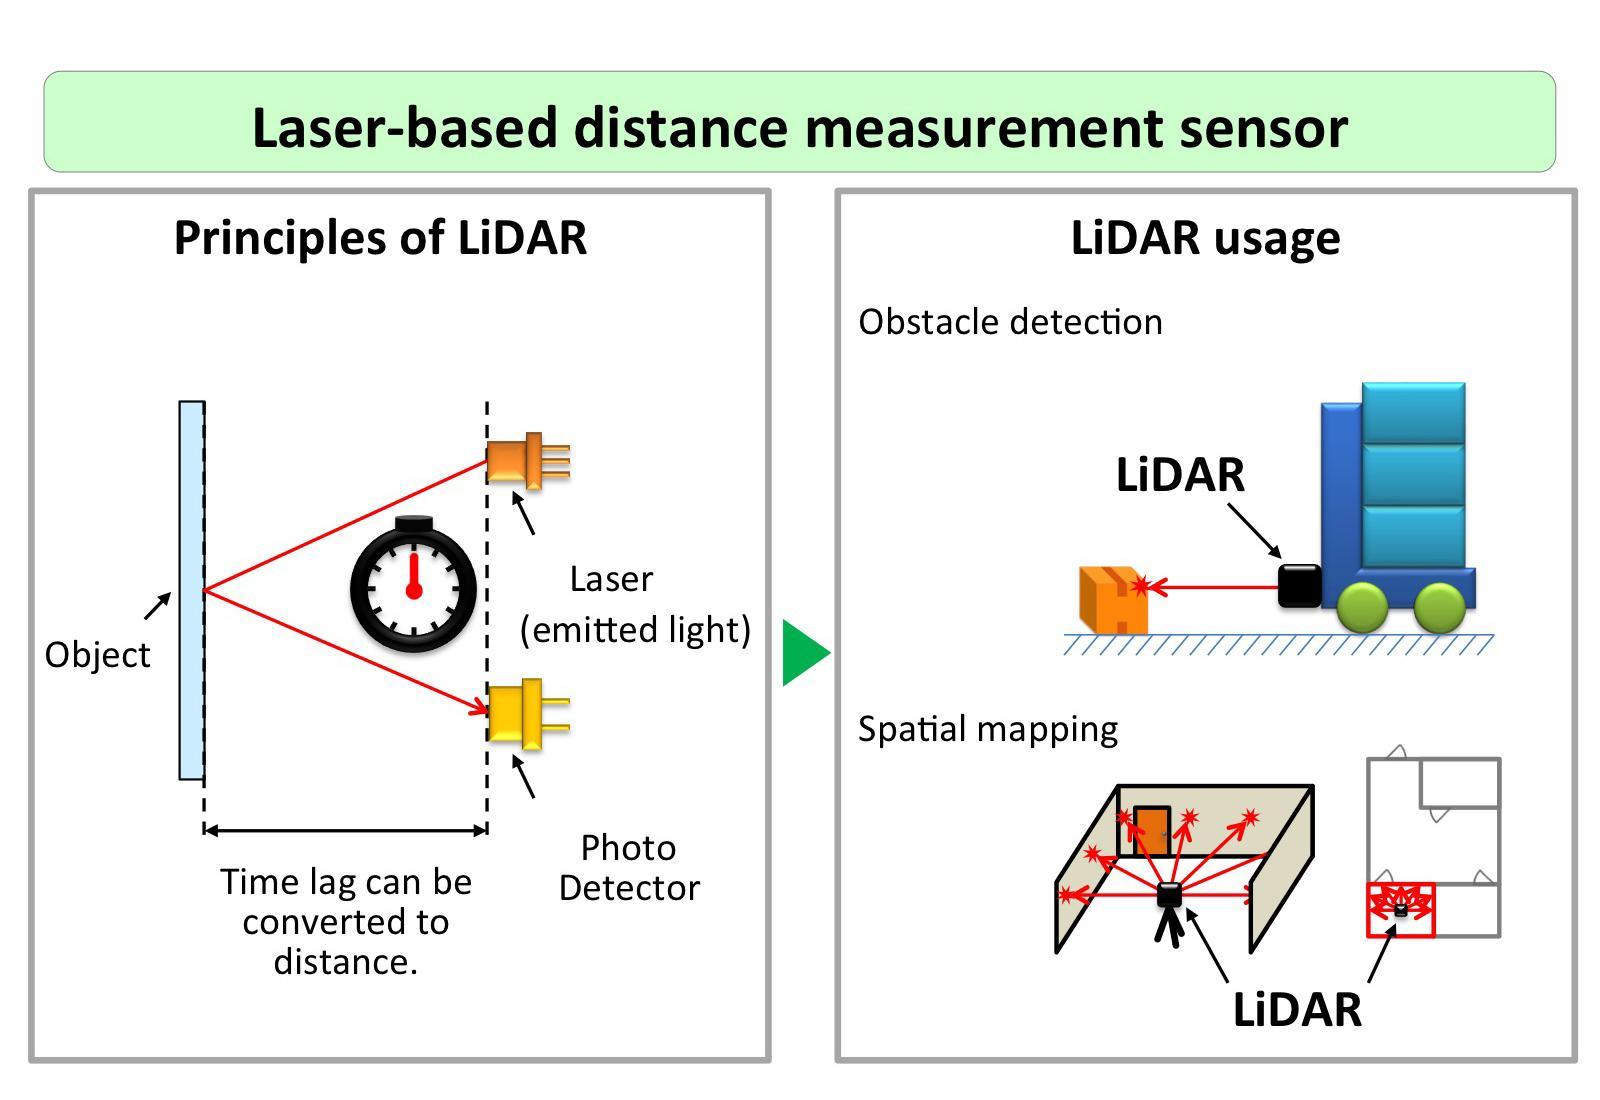 image: Principles and usage of LiDAR